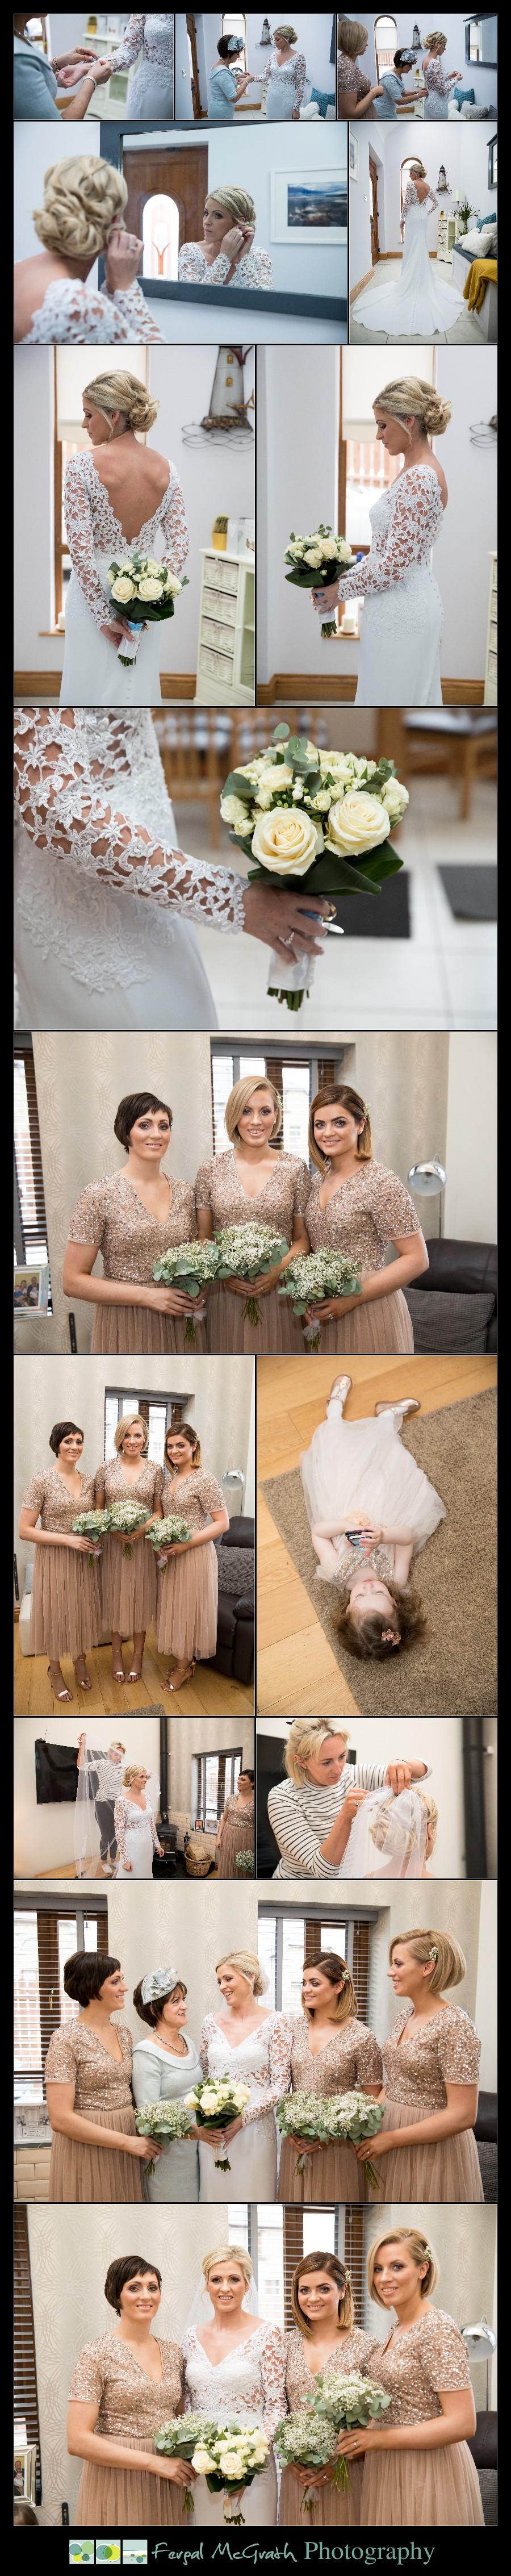 Great Northern Hotel Bundoran Winter Wedding bride getting her wedding dress on photos